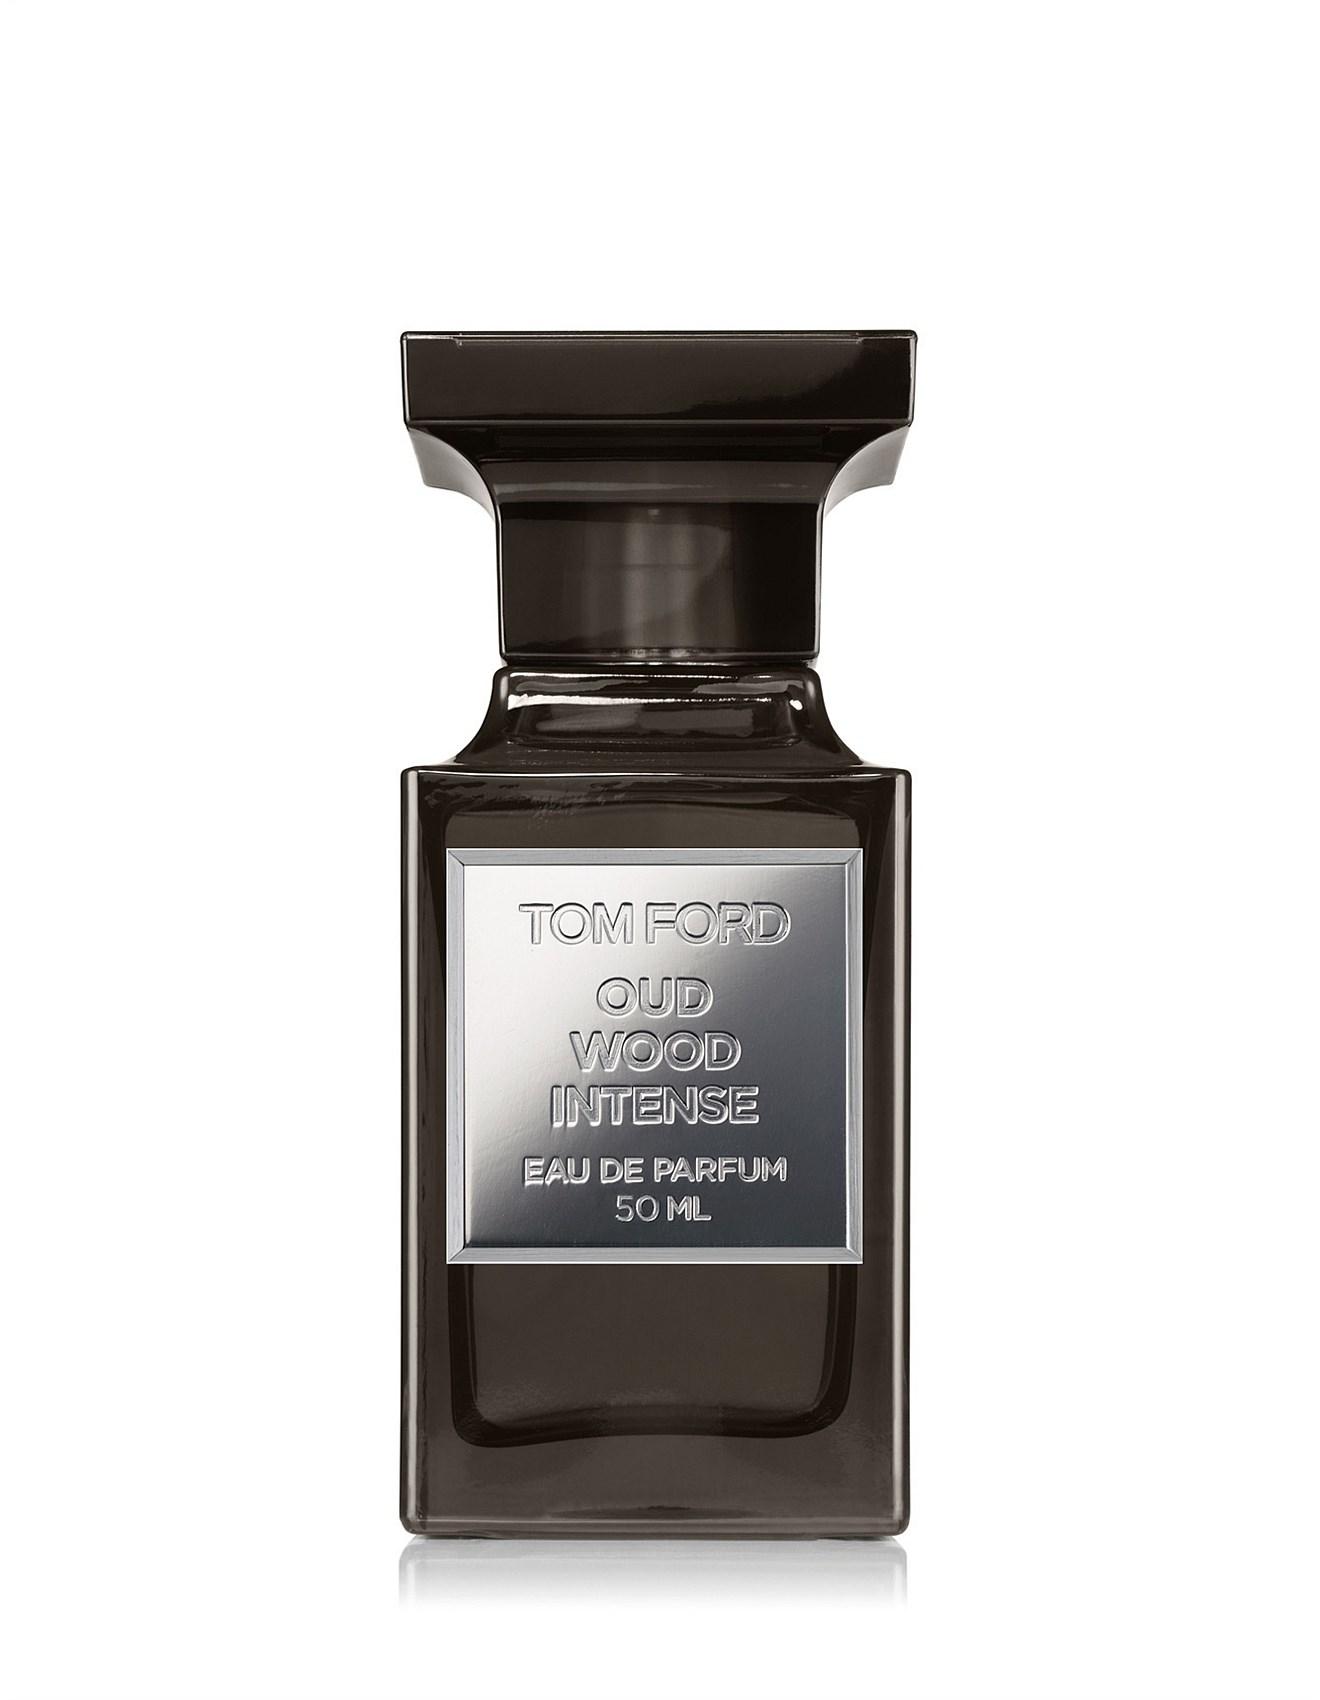 651f3e157ca16d Makeup, Perfume, Beauty, Skincare | Shop Online | David Jones - Oud Wood  Intense Eau de Parfum